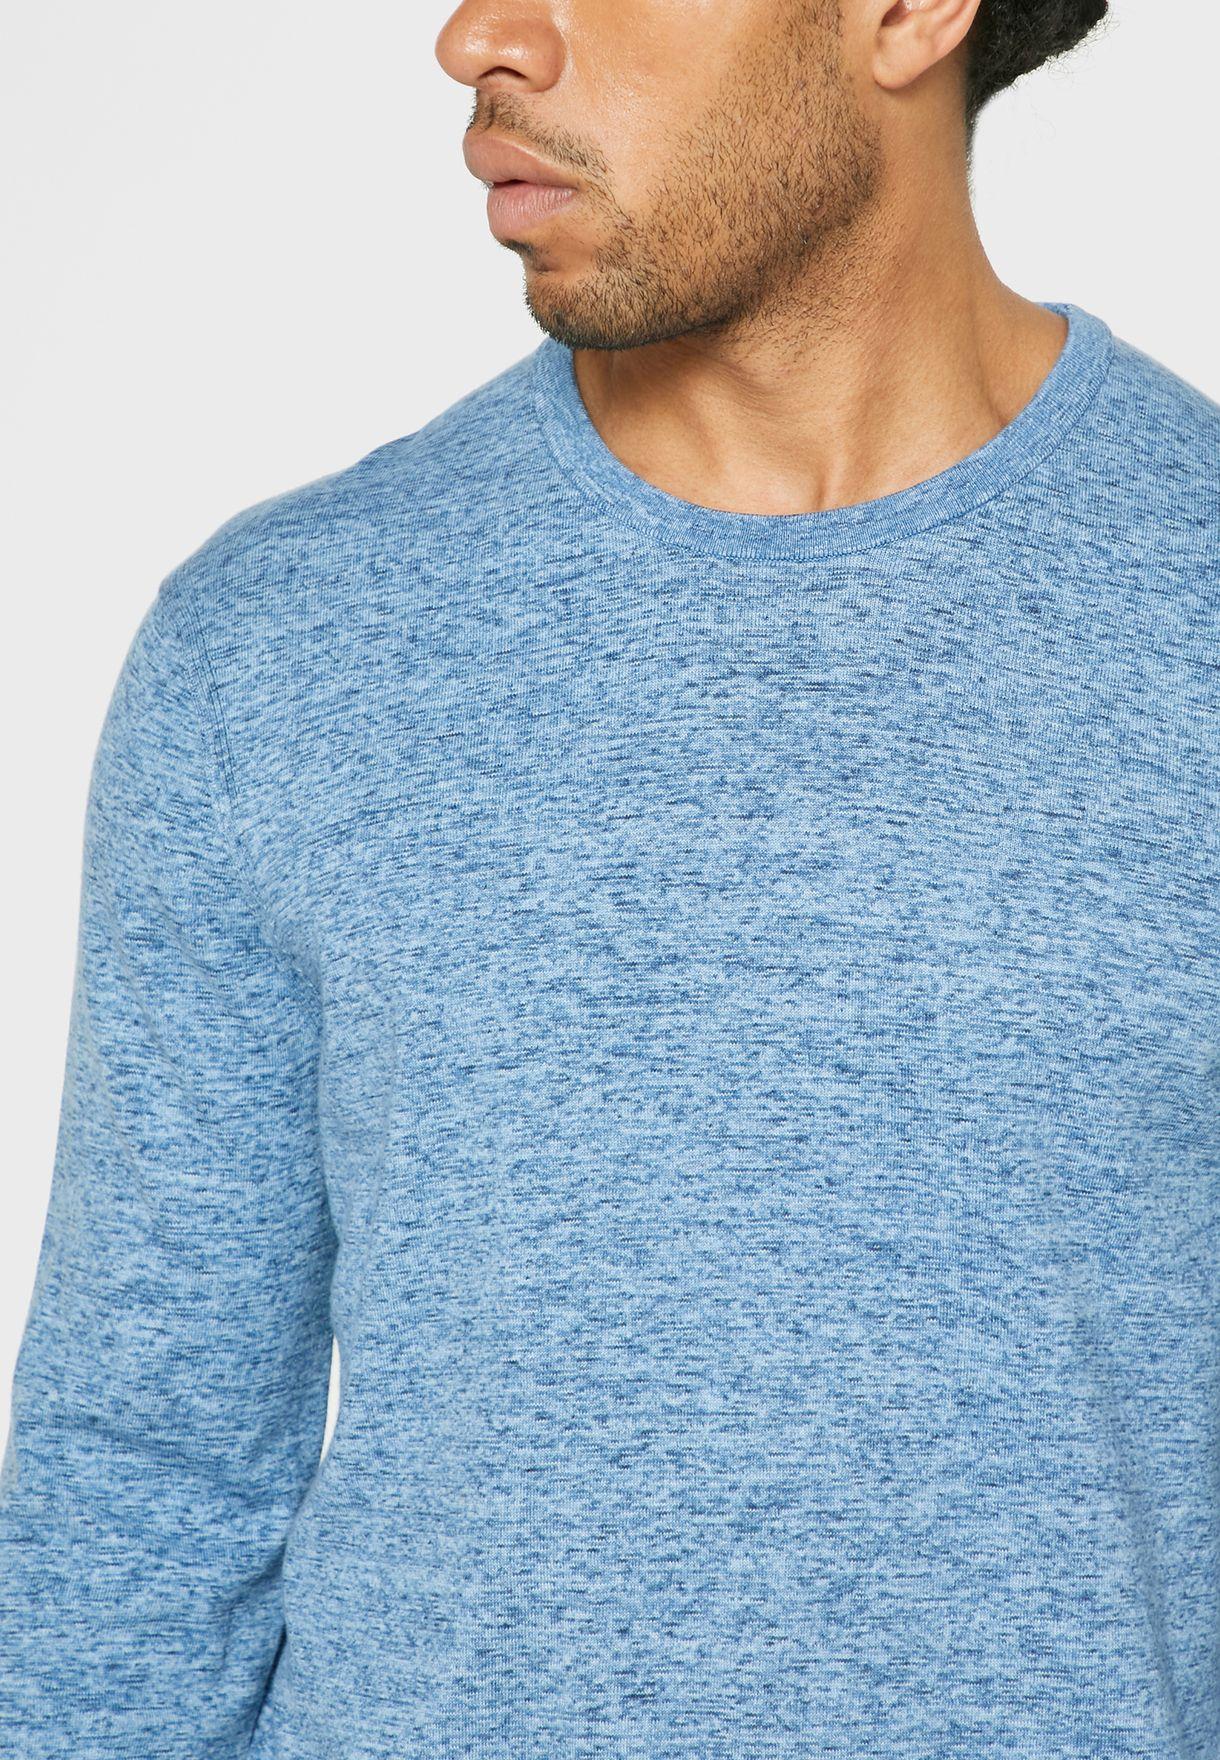 Huntington Sweater